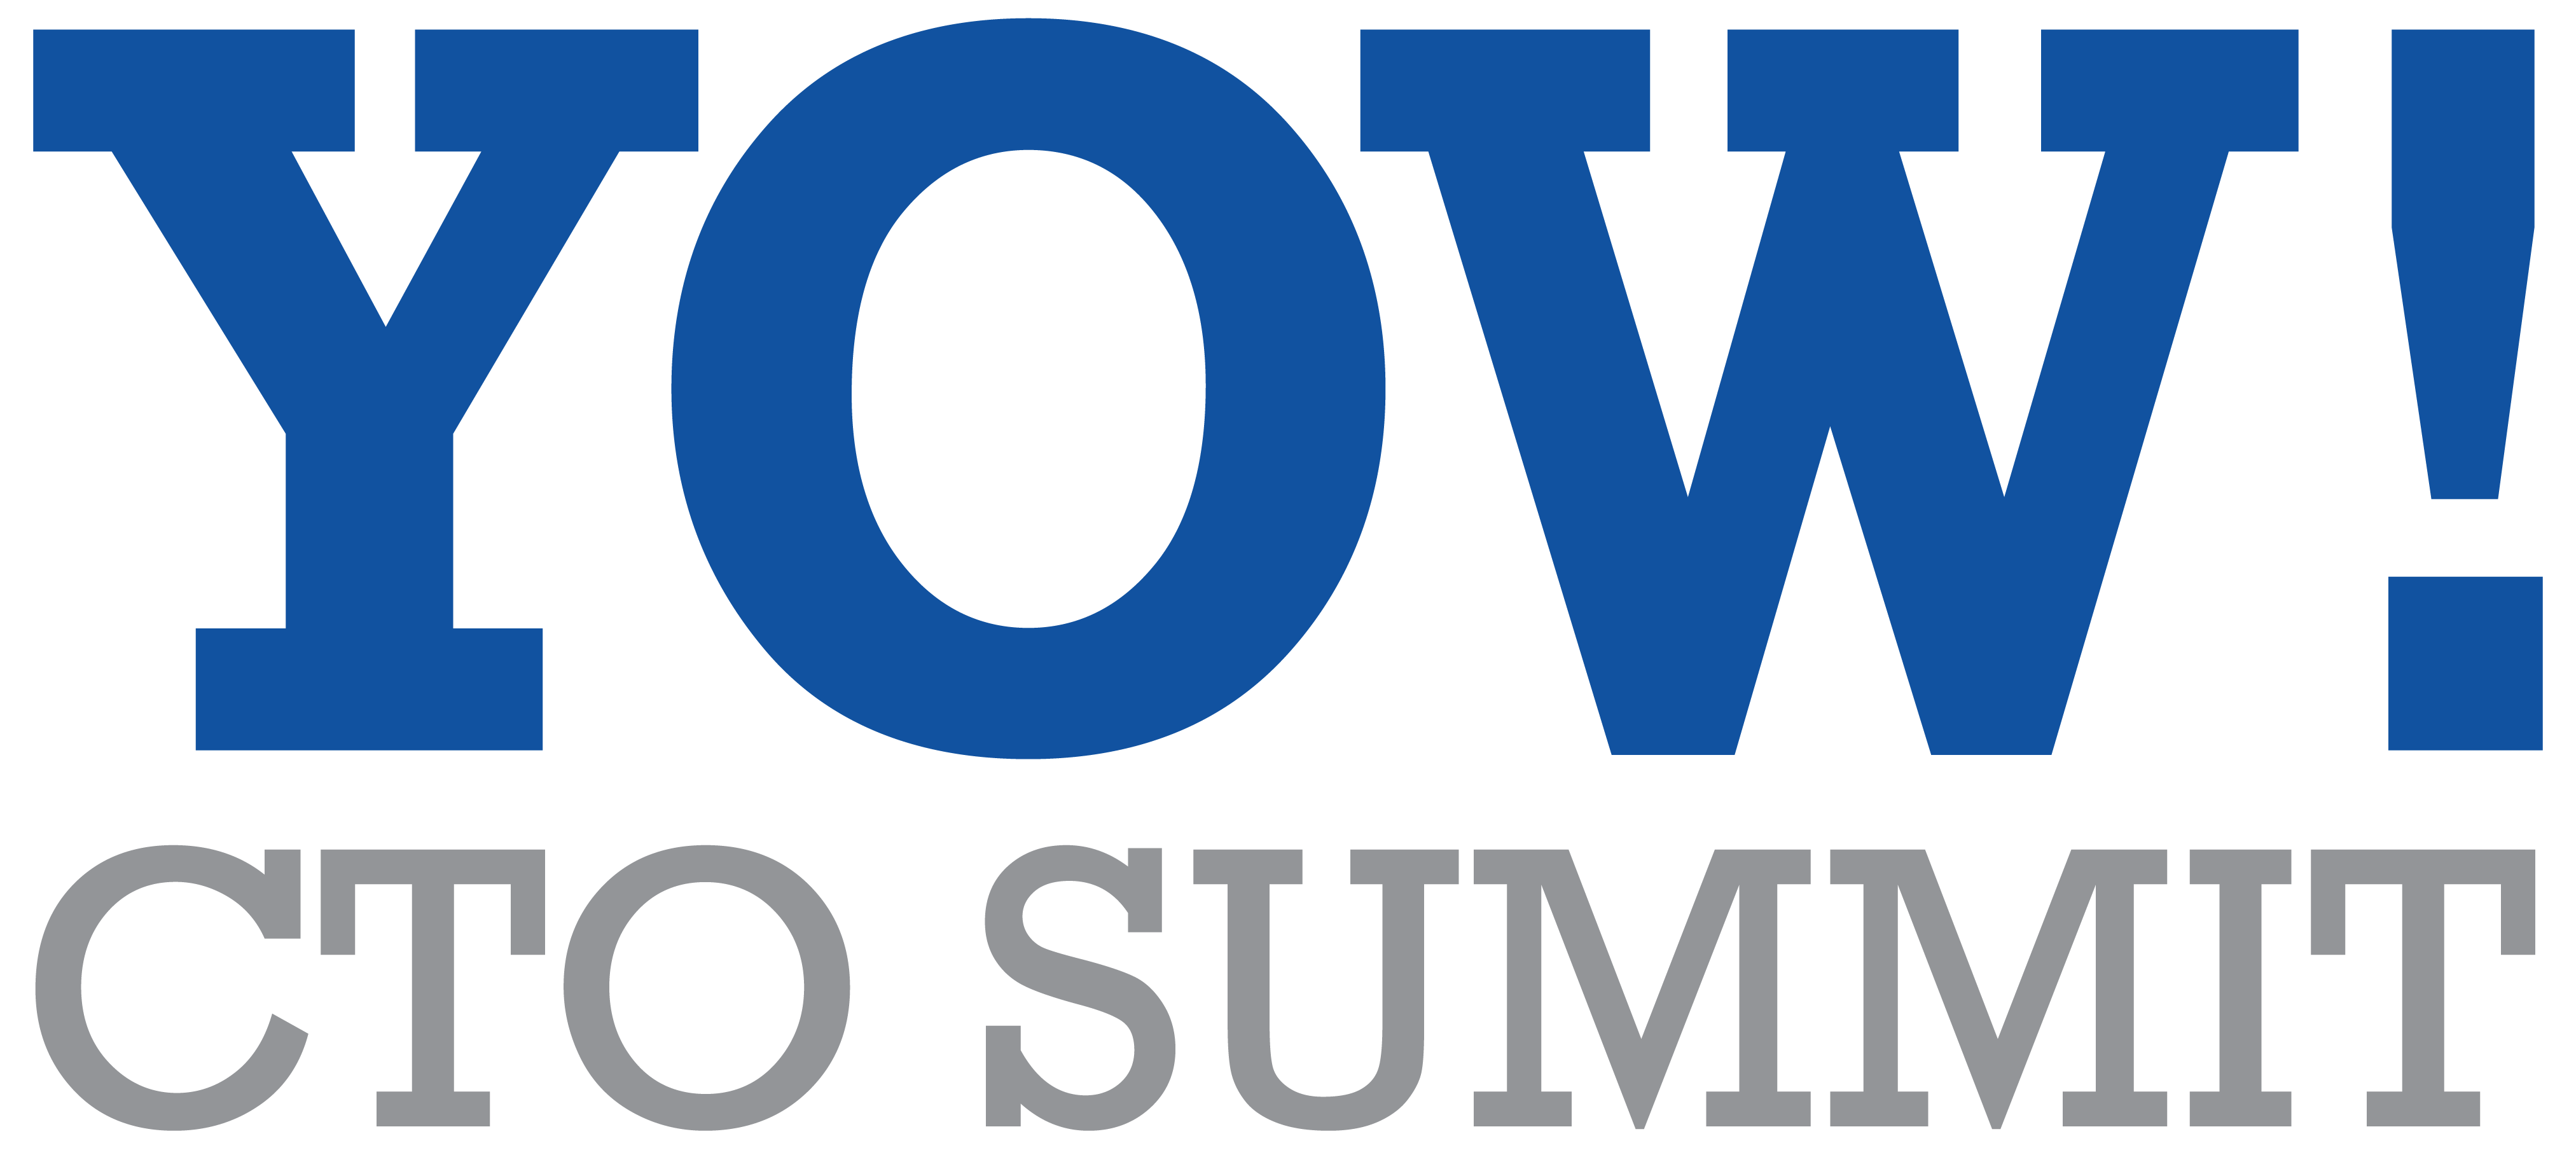 YOW! CTO Summit 2017 Melbourne